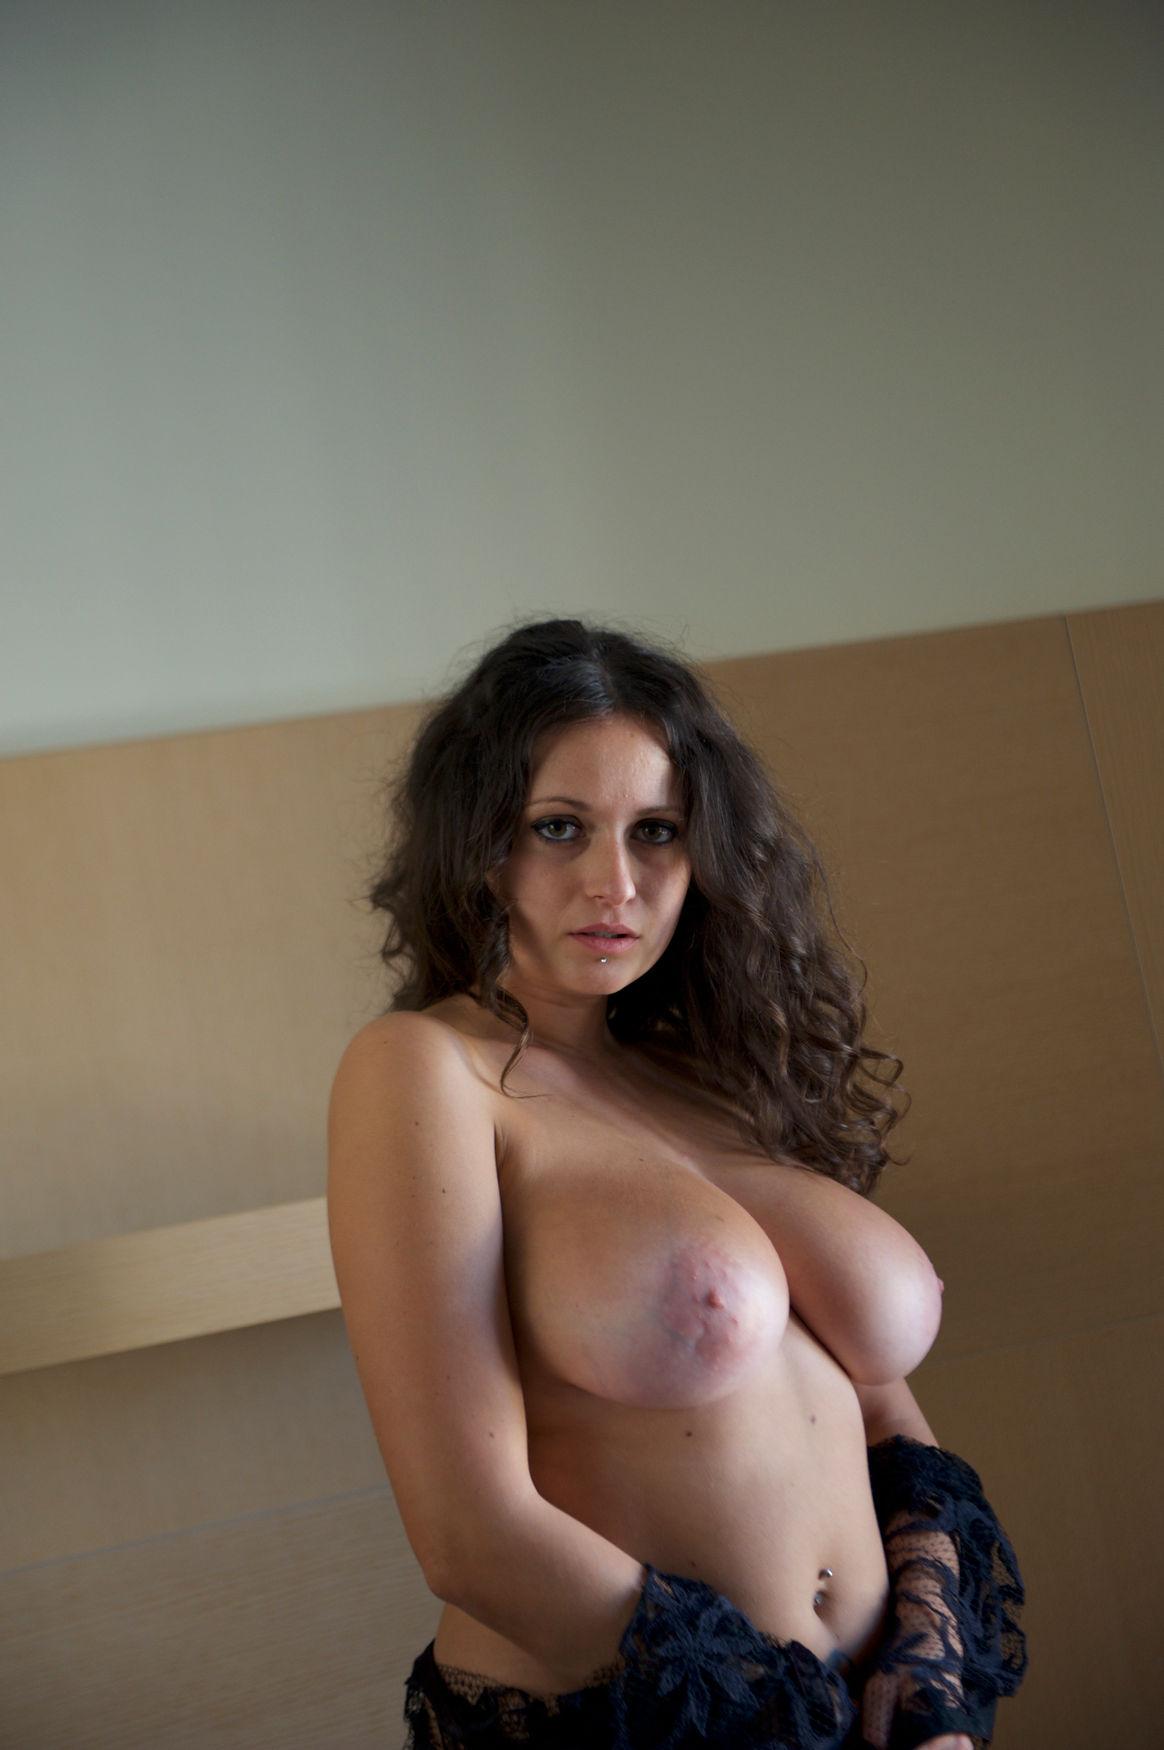 vanessa mariani topless model #vanessamariani